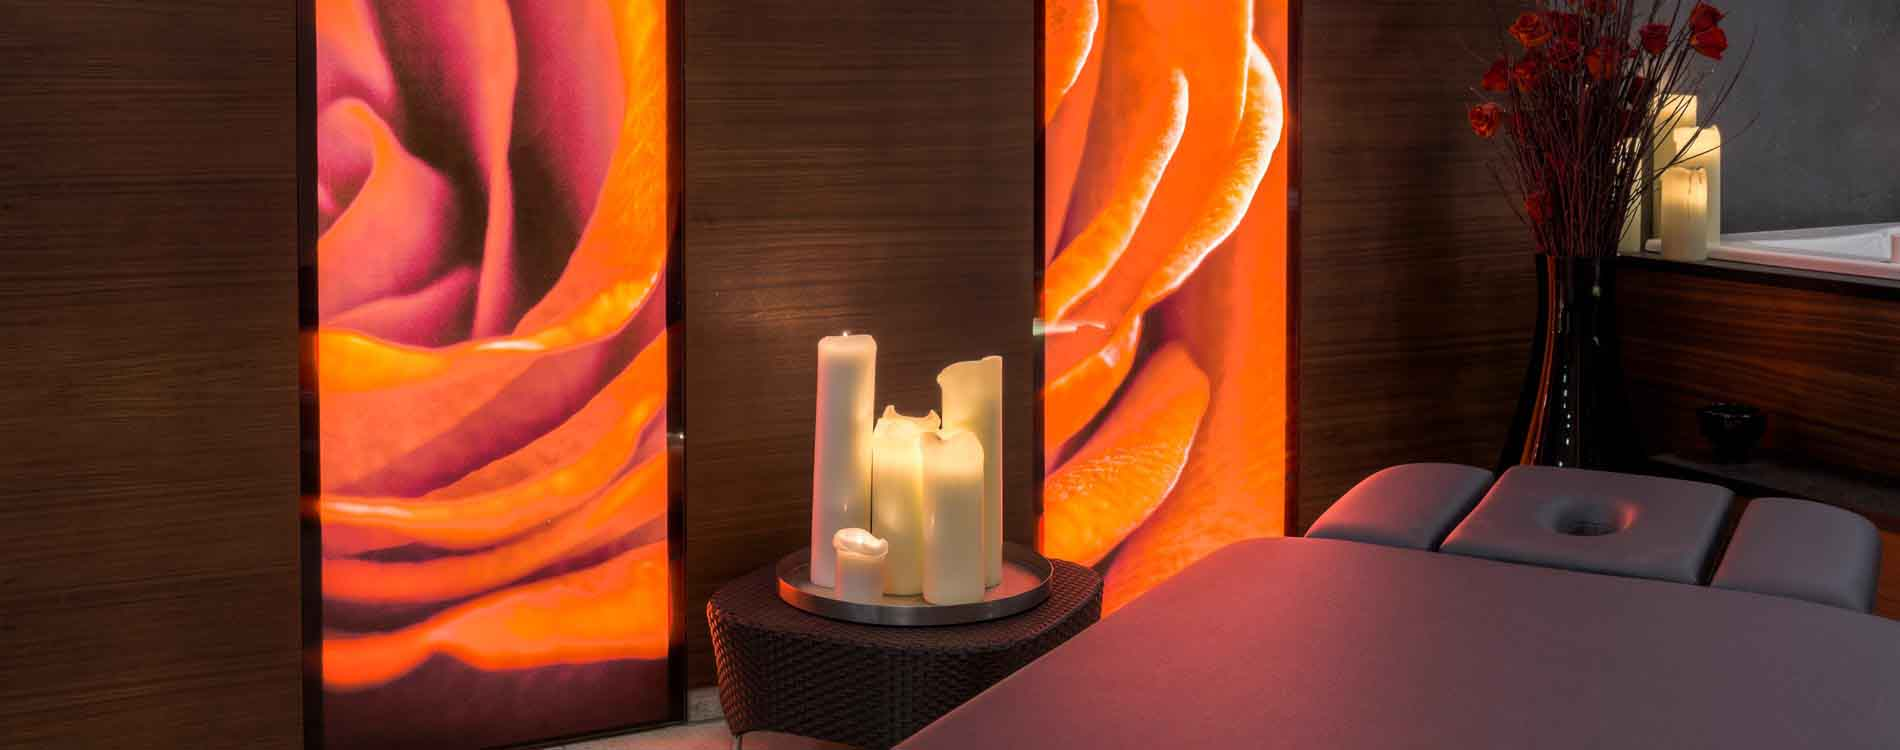 spa à deux at the 5-star Relais & Châteaux Rosengarten Kirchberg Kitzbuehel